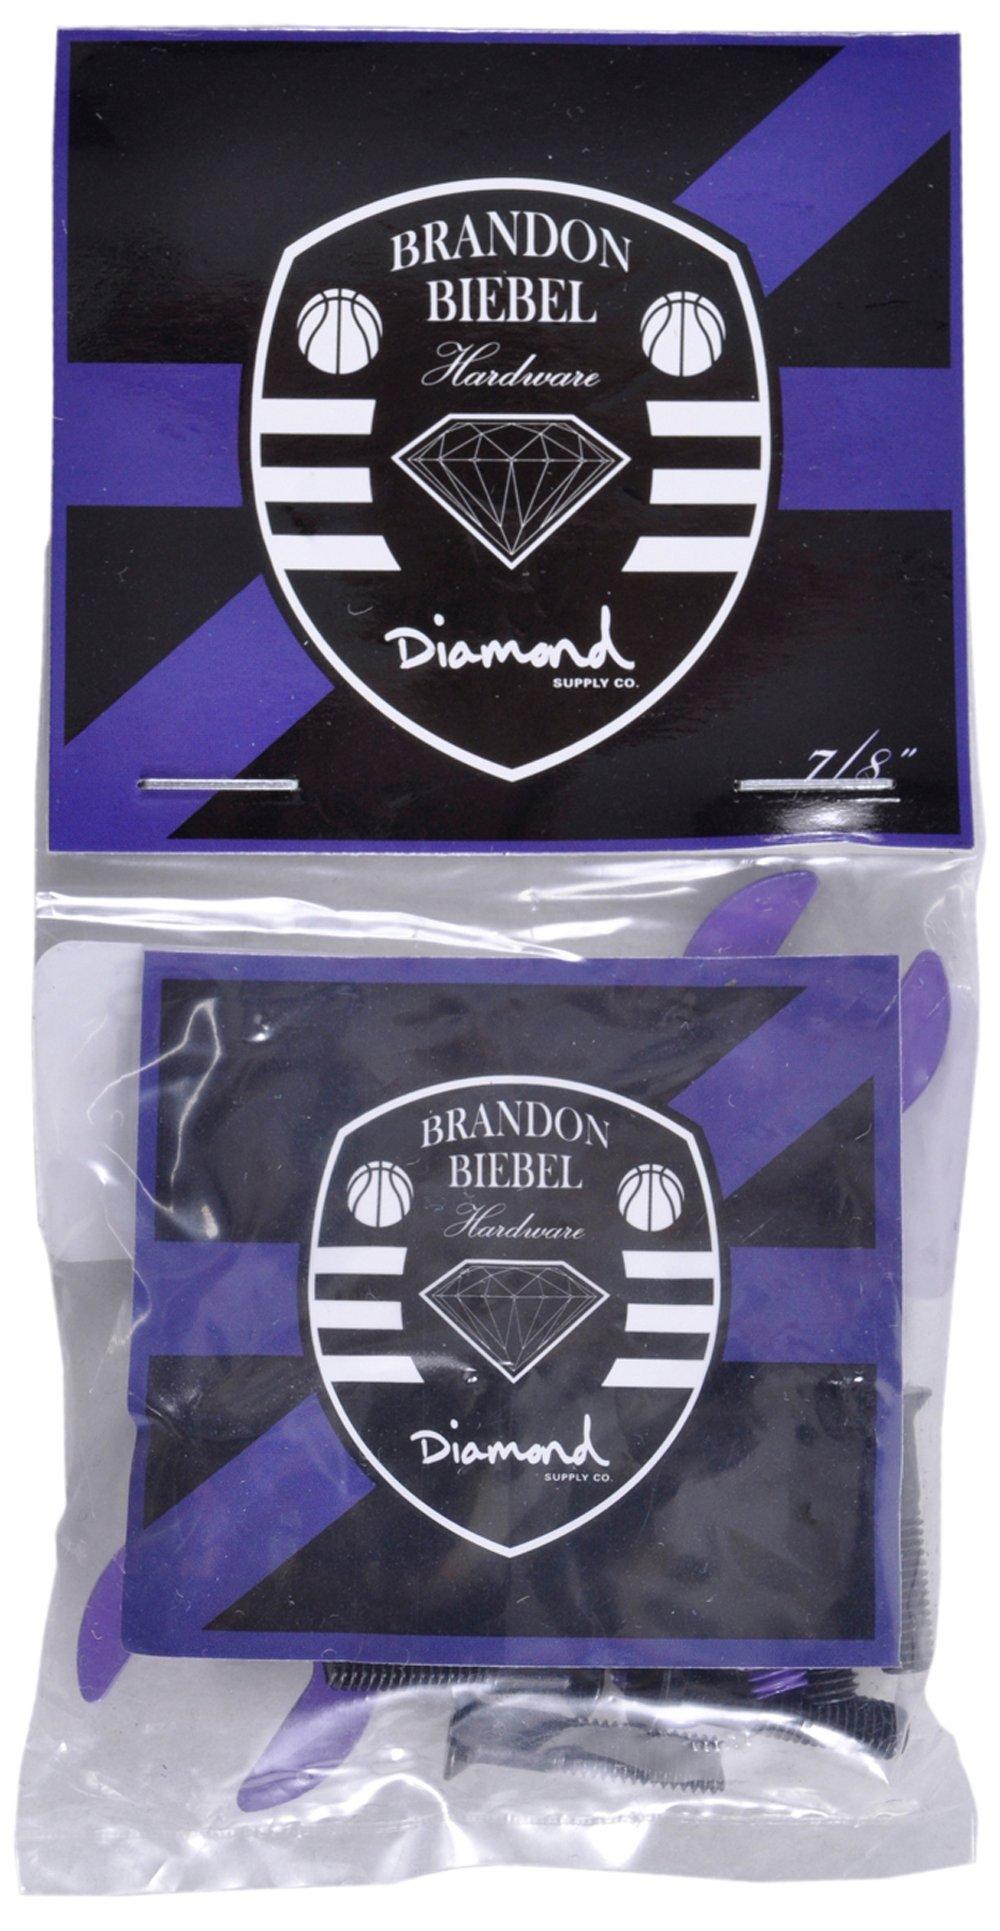 Diamond Supply Co Hella Tight Purple Skate Brandon Biebel HardWare